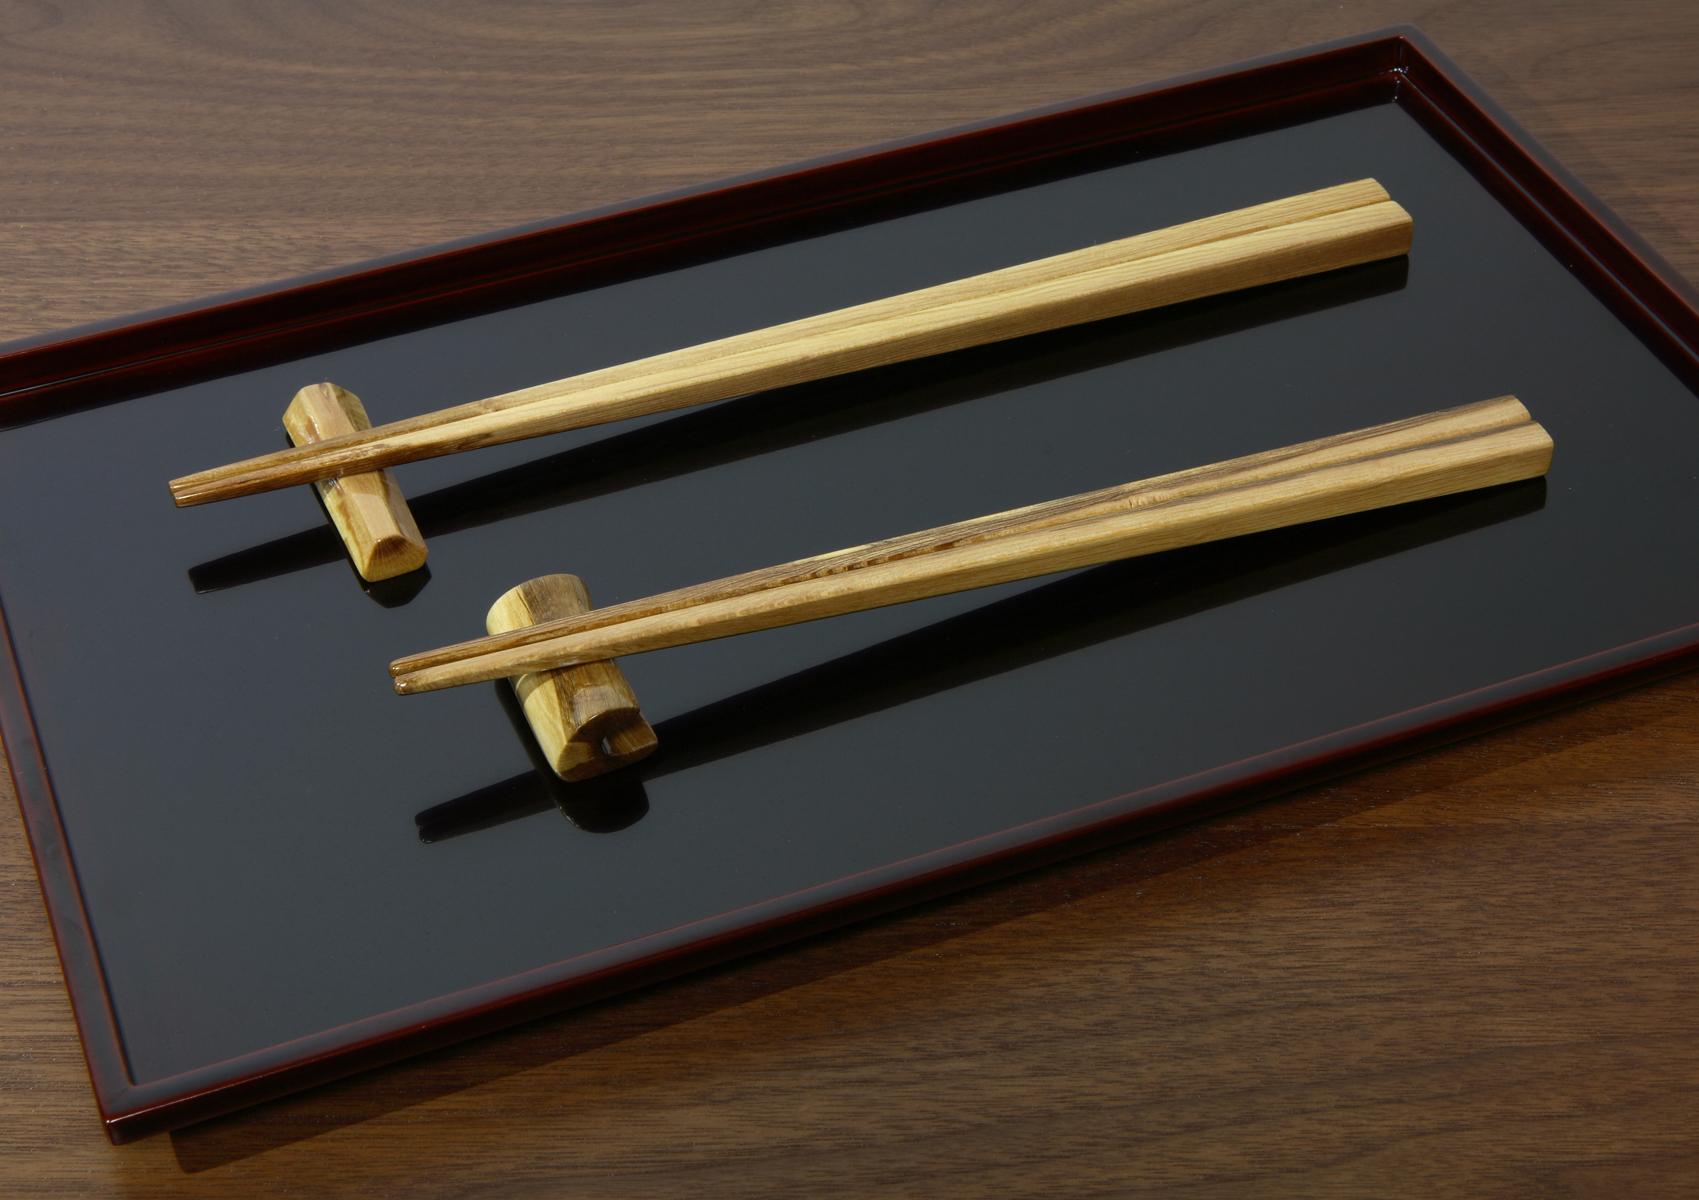 Rose Chopsticks 01:バラのお箸 1